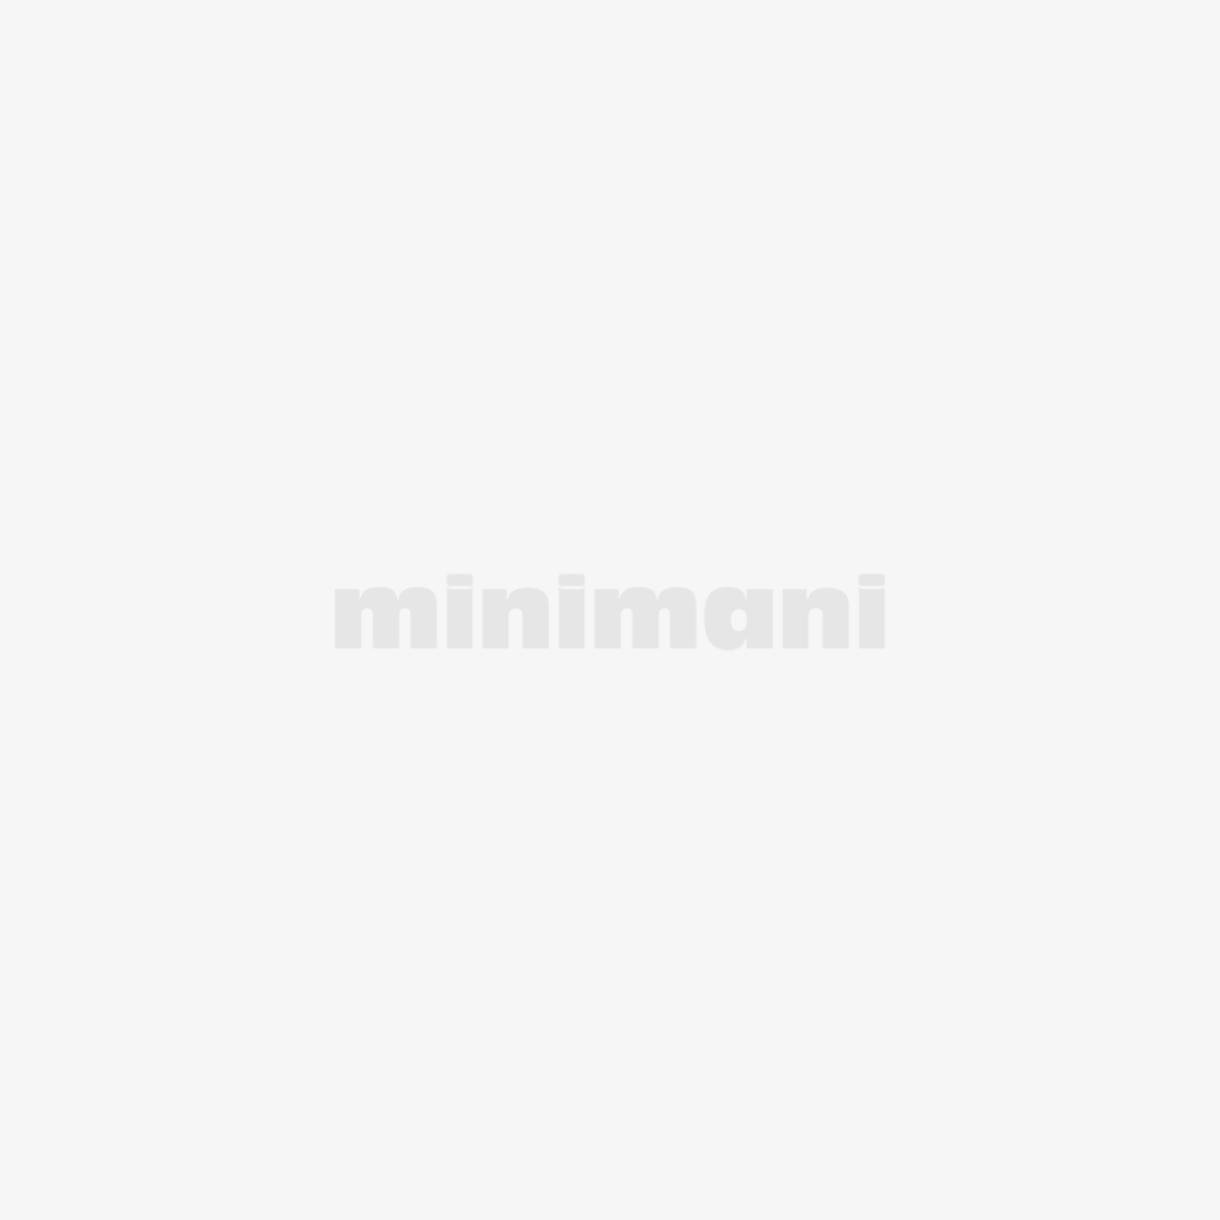 M-FILTER ÖLJYNSUODATIN  MU 1214